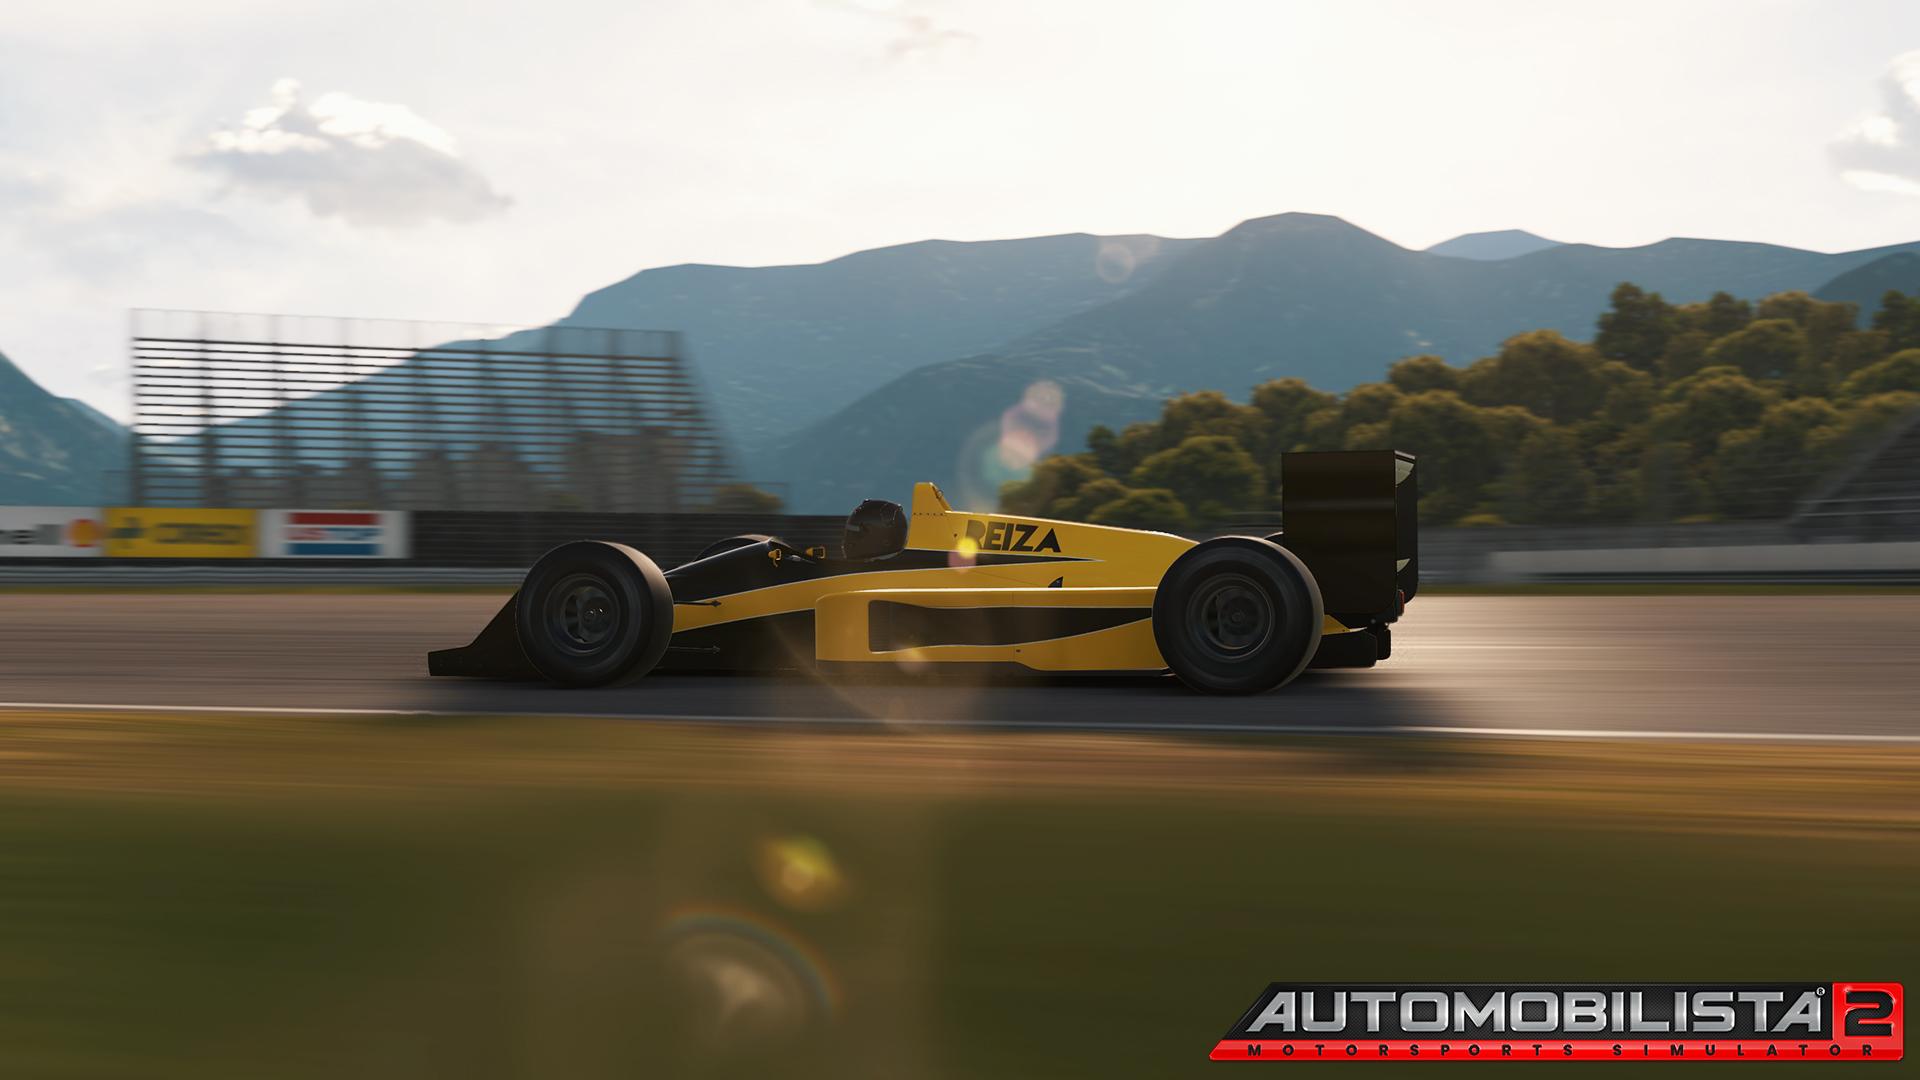 Reiza AMS 2 Preview 3.jpg